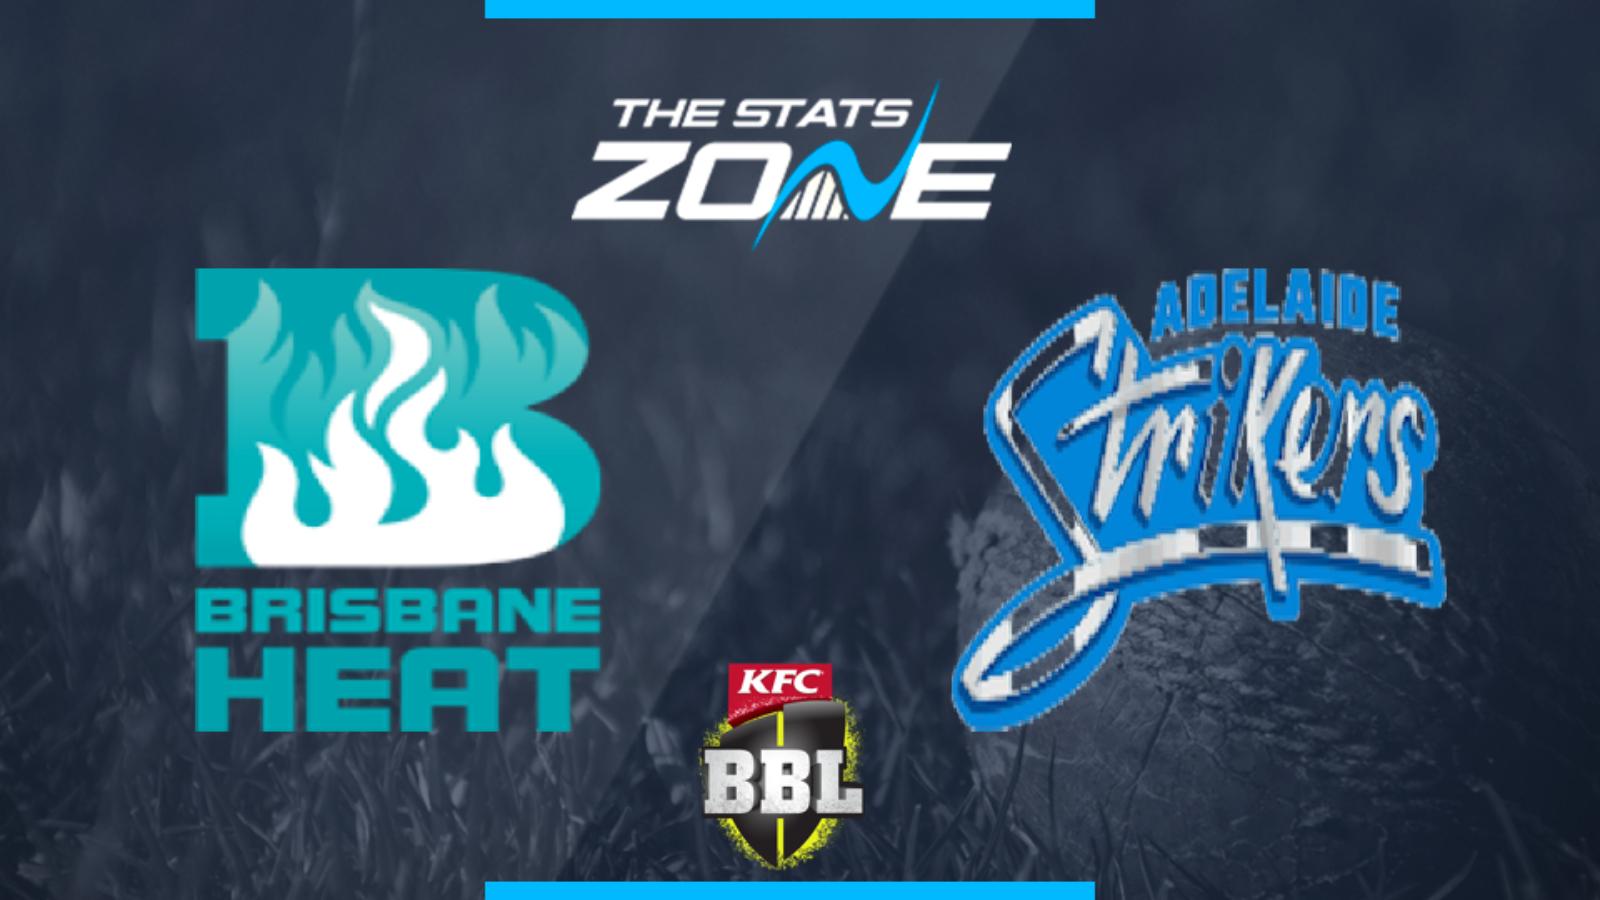 2019 20 Big Bash League Brisbane Heat Vs Adelaide Strikers Preview Prediction The Stats Zone